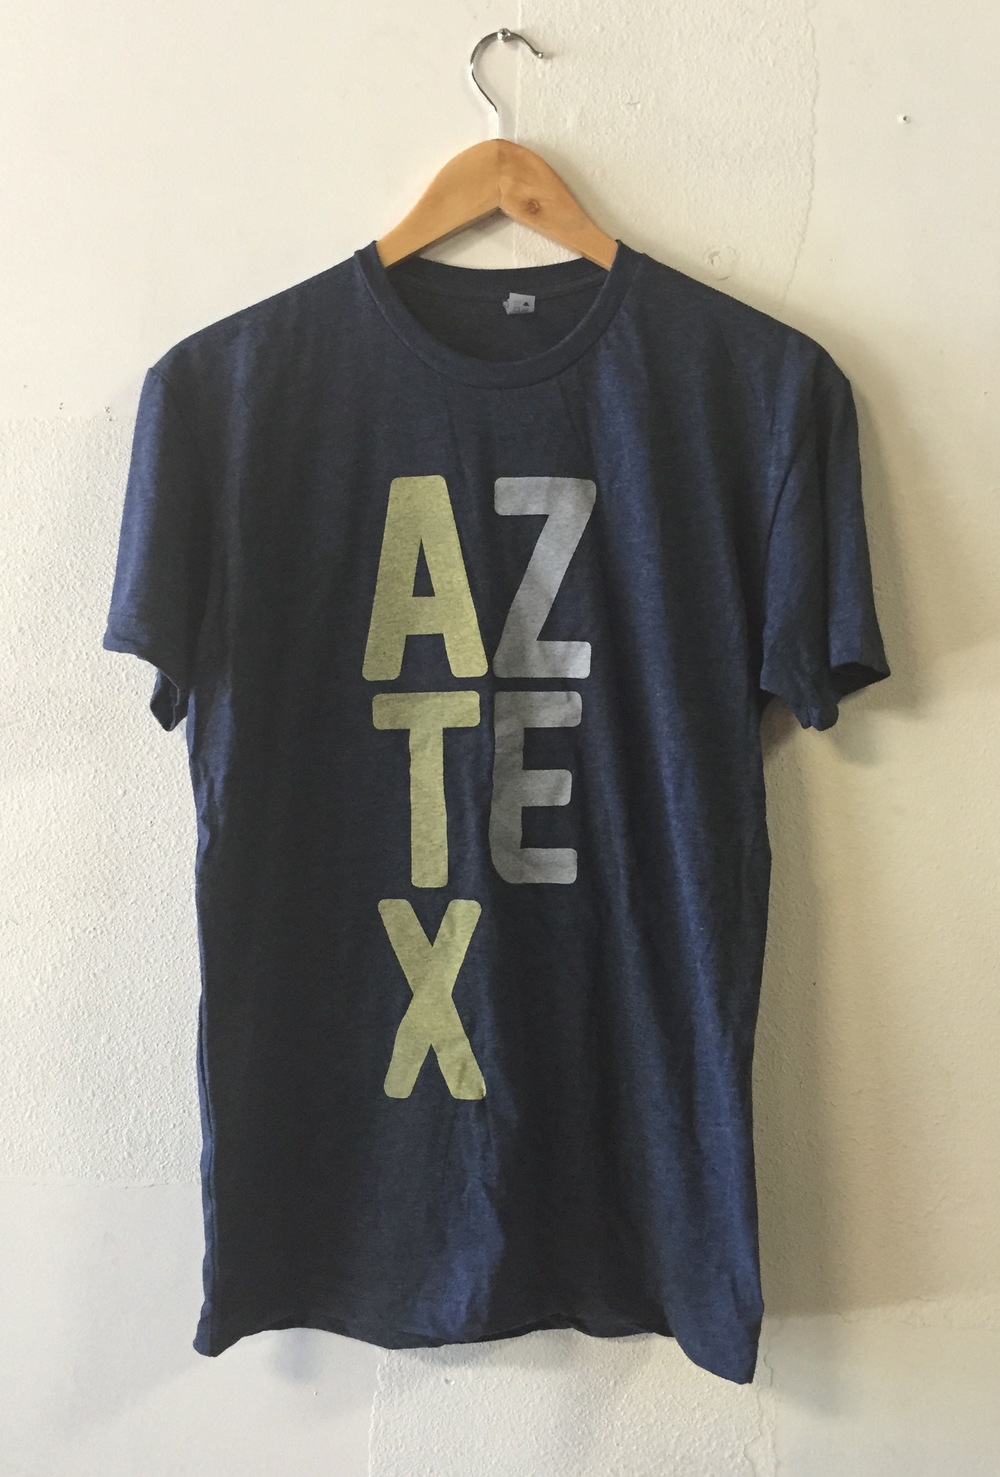 aztex2.jpg